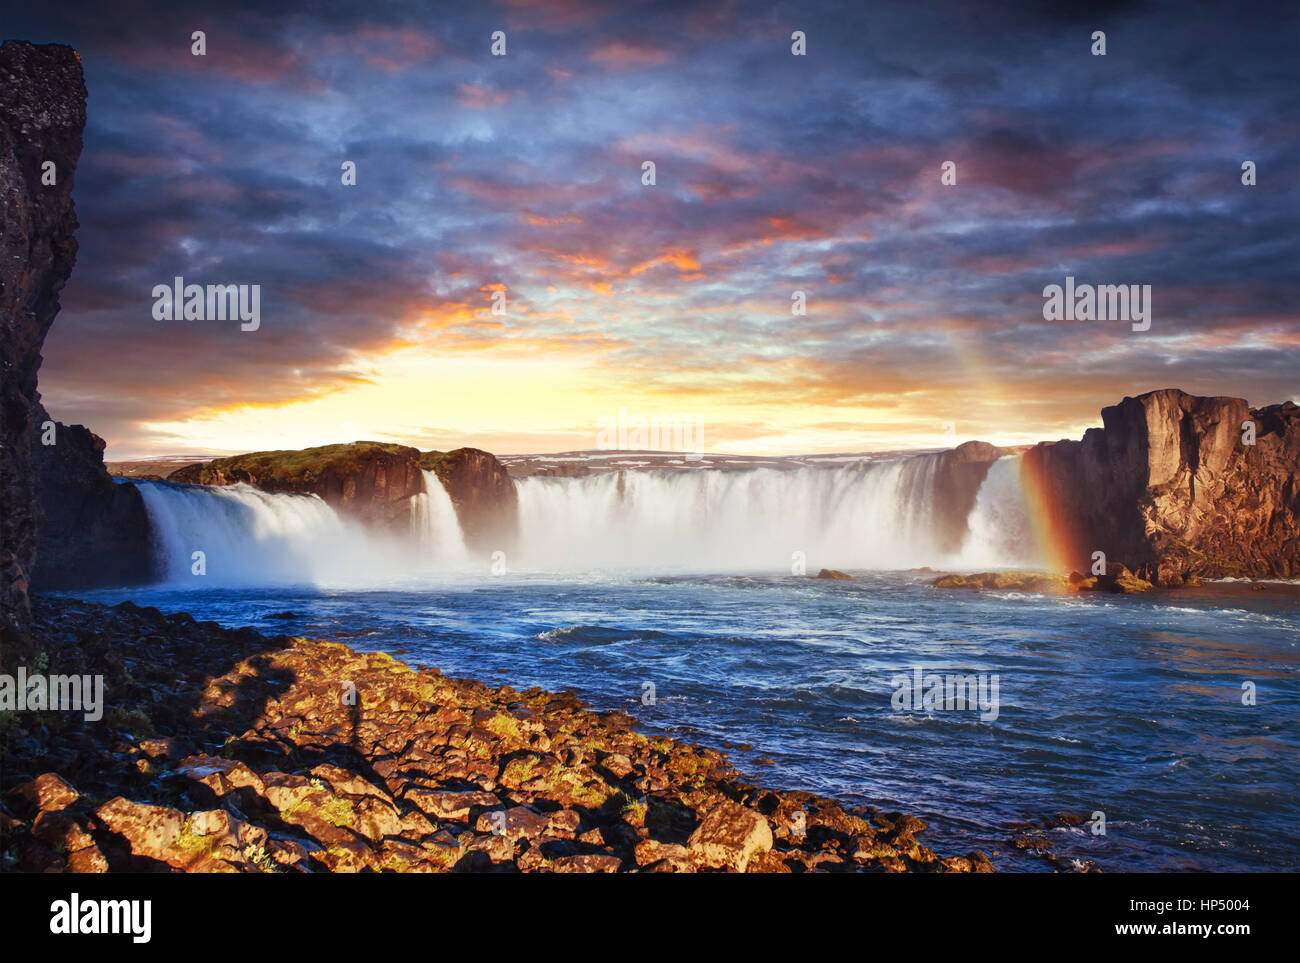 Cascade Godafoss au coucher du soleil. Beauty World. L'Islande, de l'Europe Photo Stock